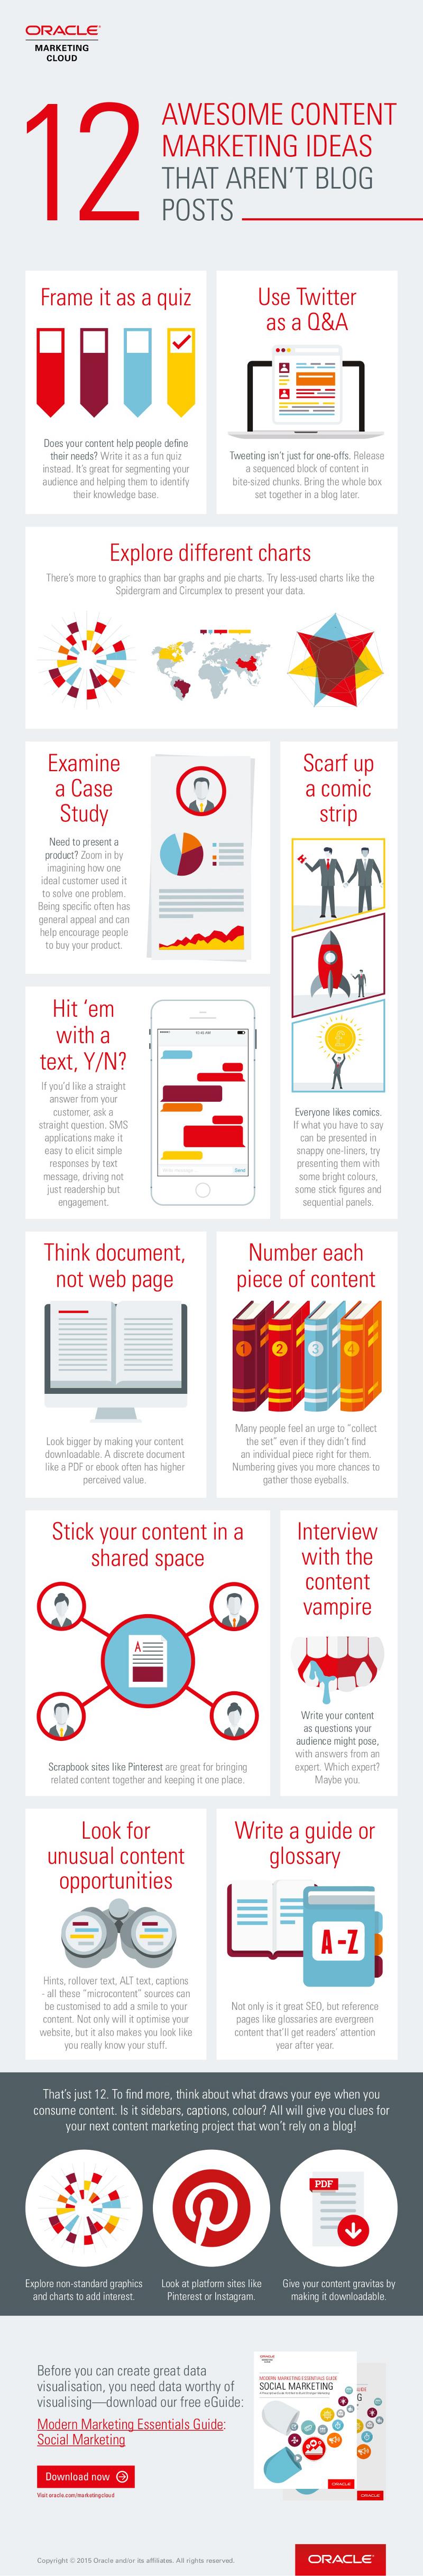 Content-Marketing-Ideas